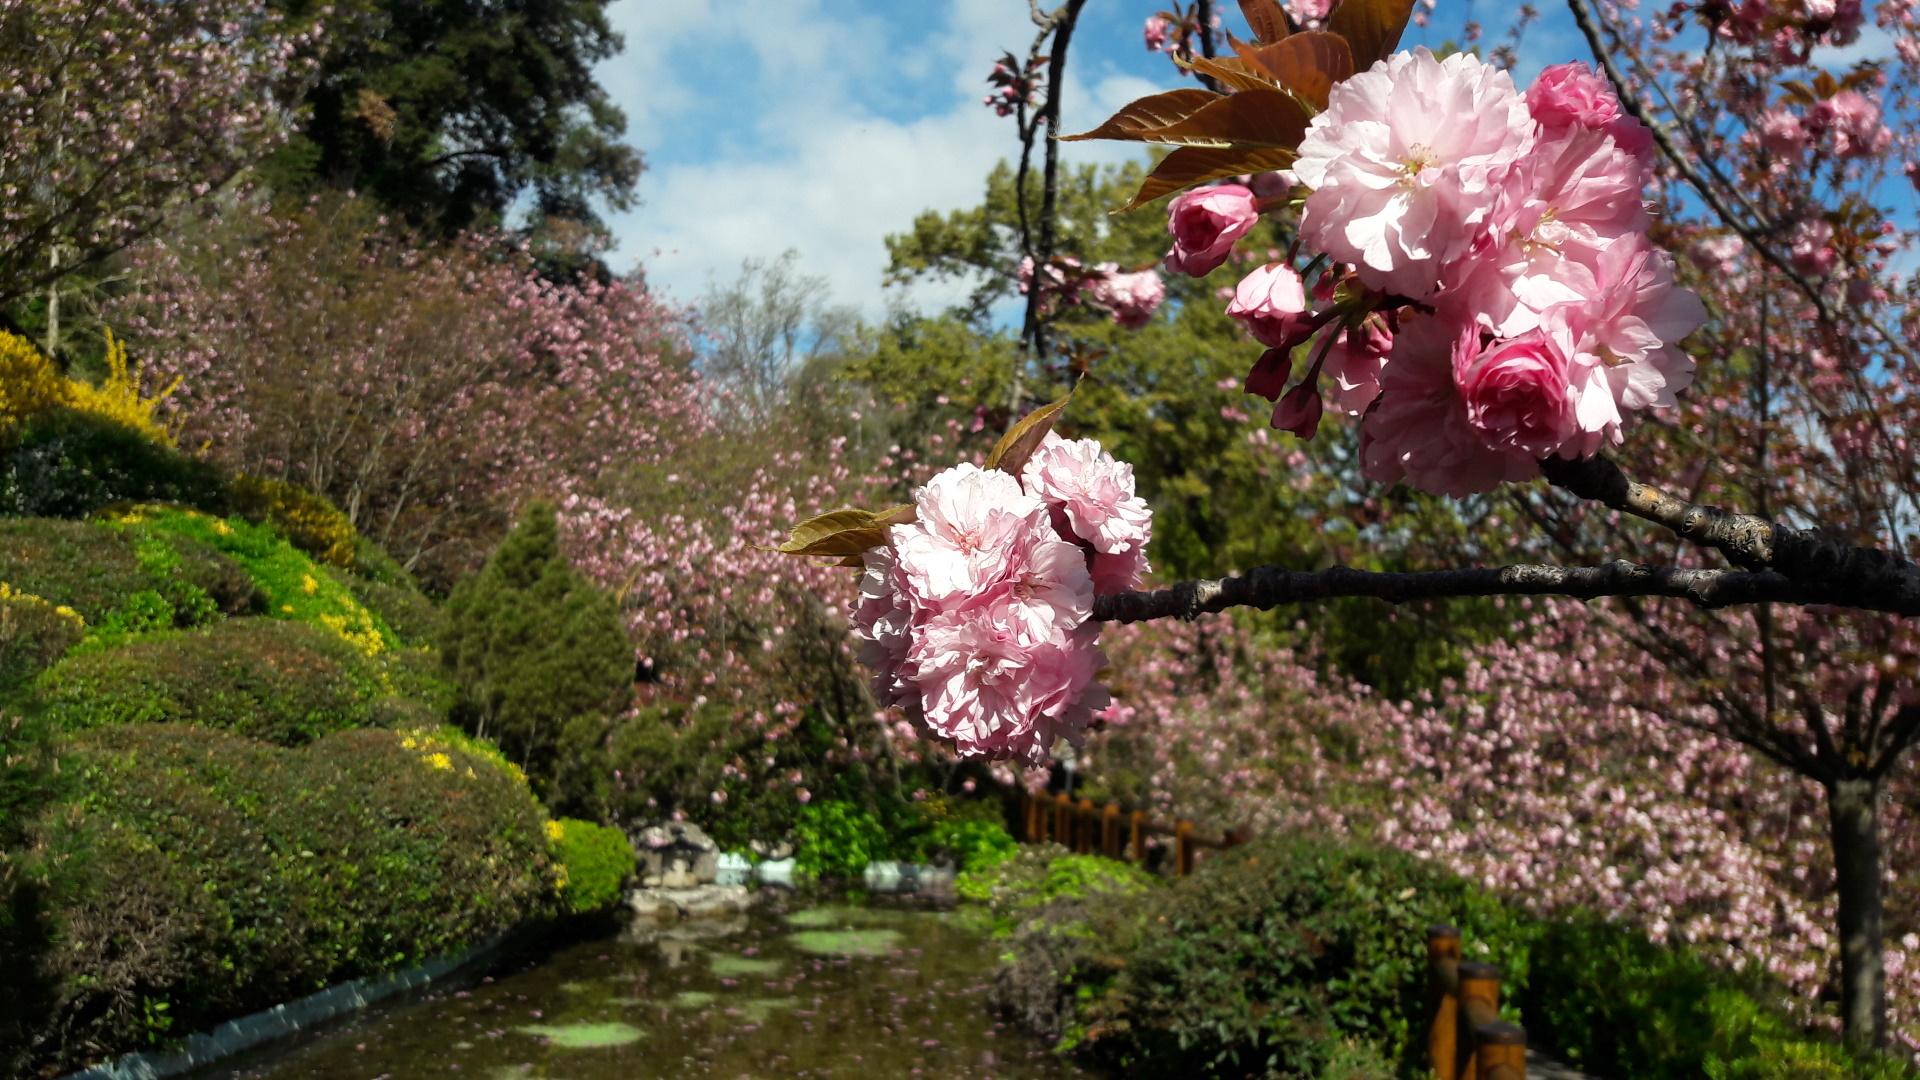 Orto Botanico di Roma - Giardino giapponese_Ph. Tarquini